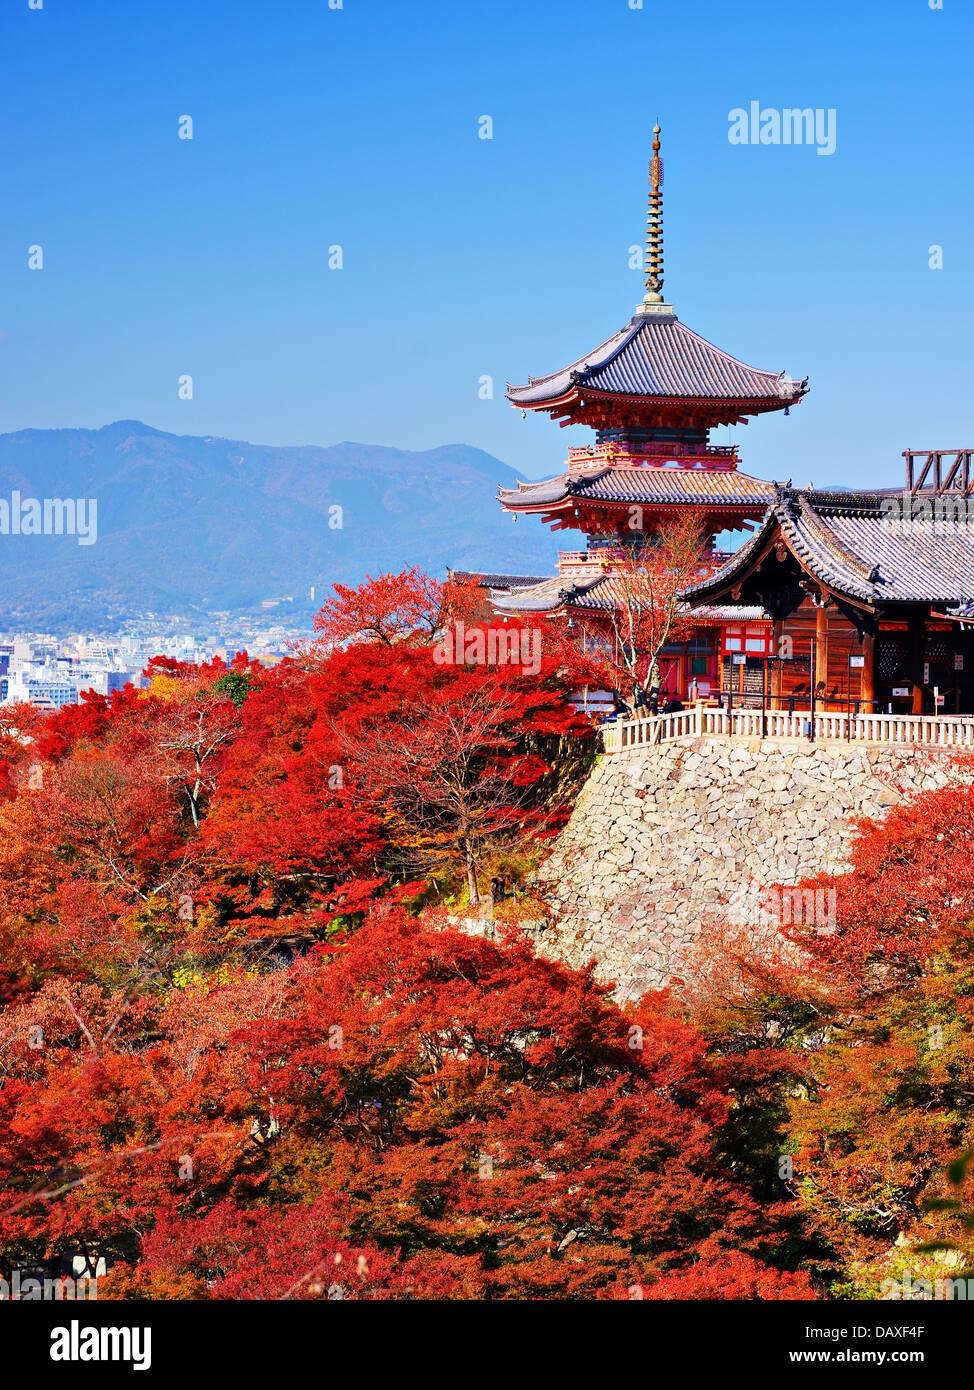 Kiyomizu-dera pagoda with fall colors in Kyoto, Japan. - Stock Image